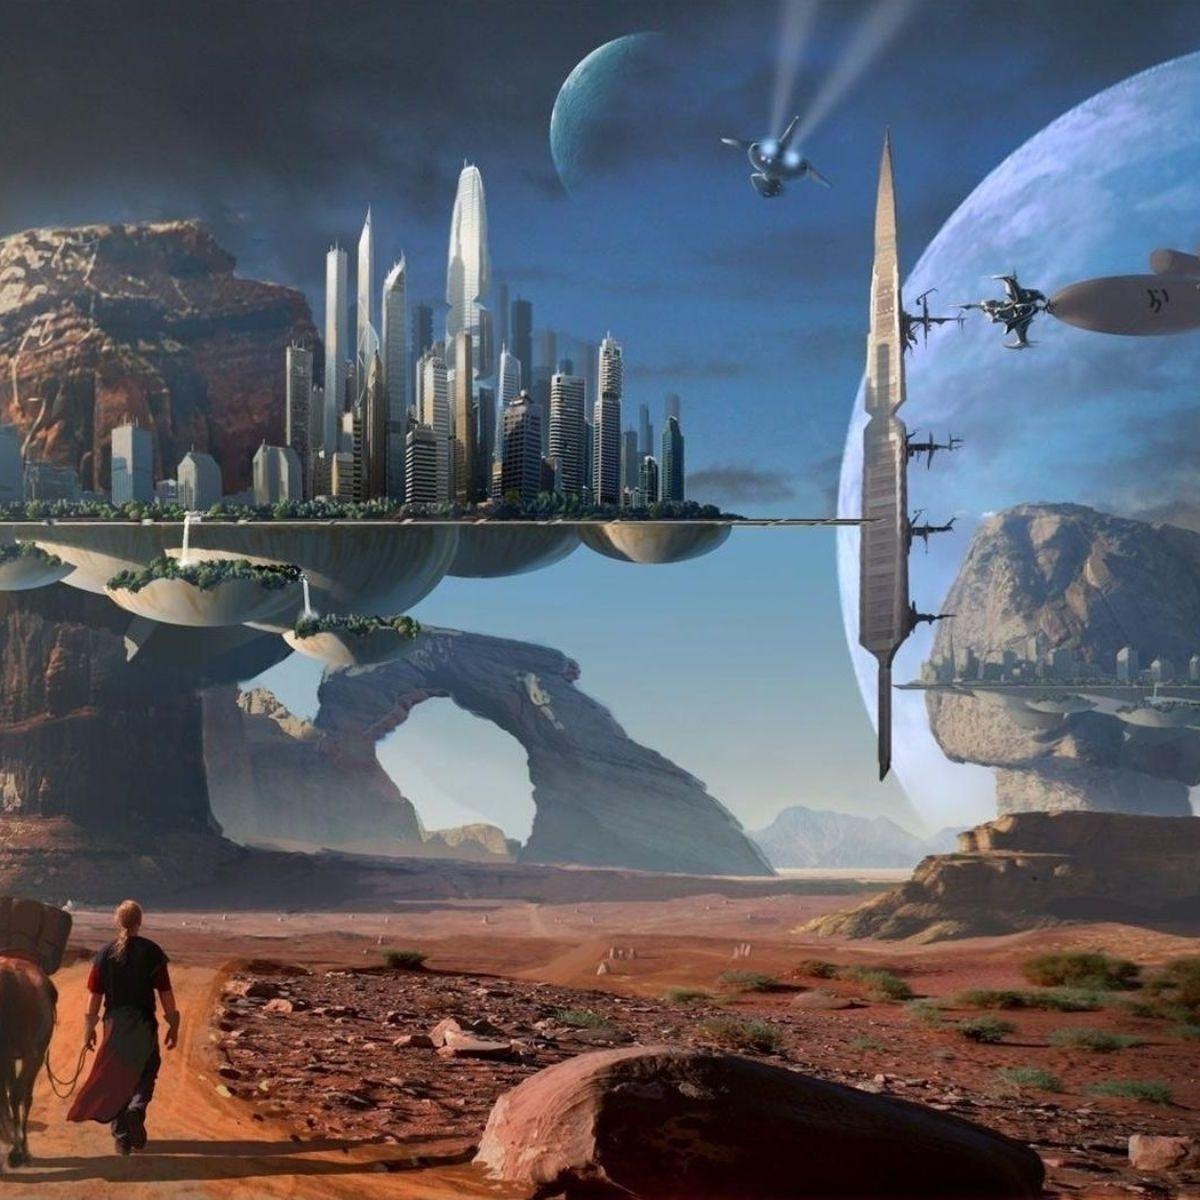 sci_fi_space_station_wallpaper.jpg